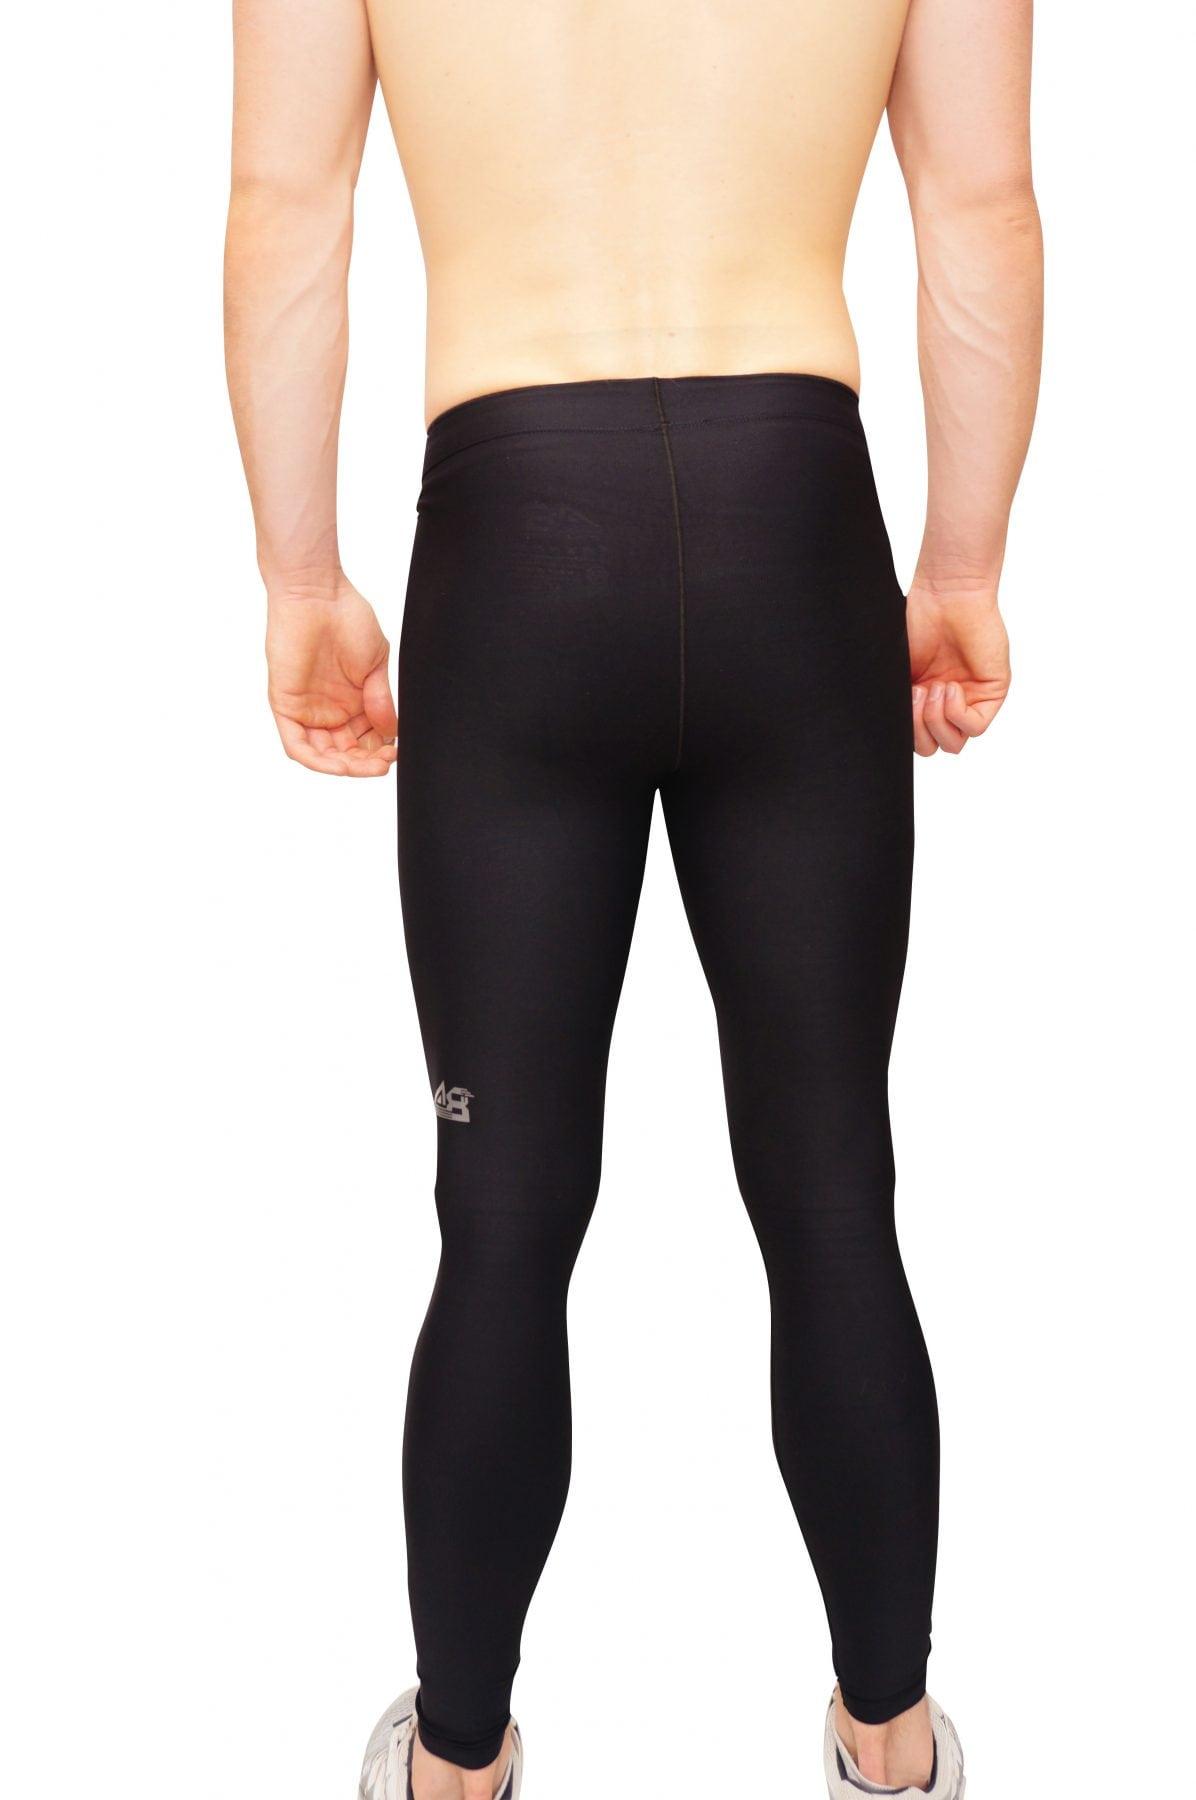 bb64456e5c Marena Active Tights Mens Compression pants Mens leg surgical compression  pants stage 3